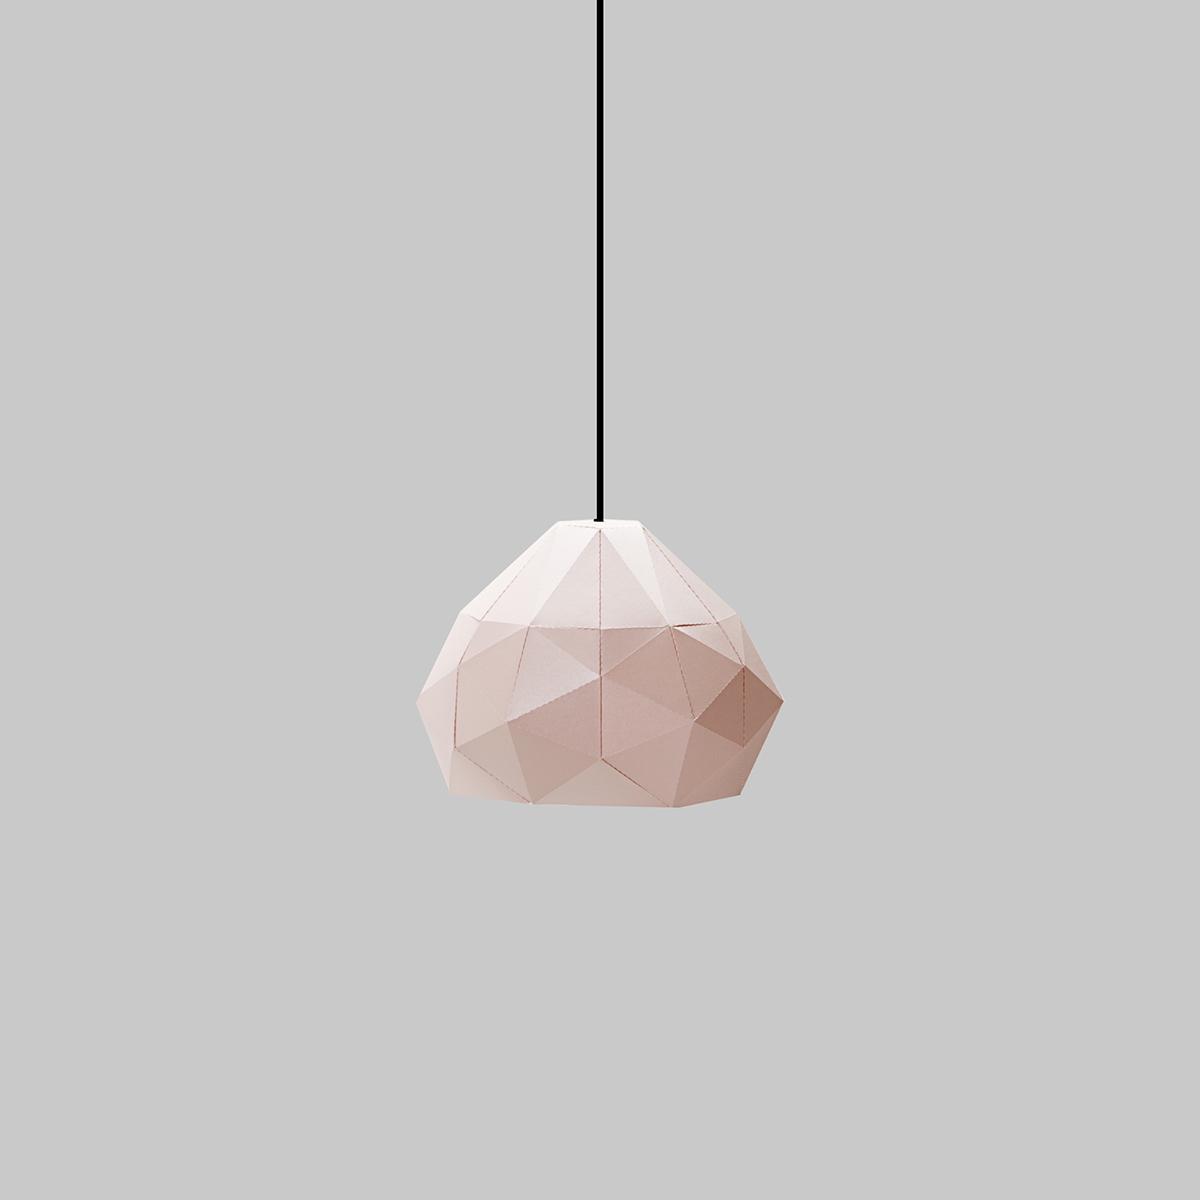 capelo lampara Lamp design poly flatpack lowpoly